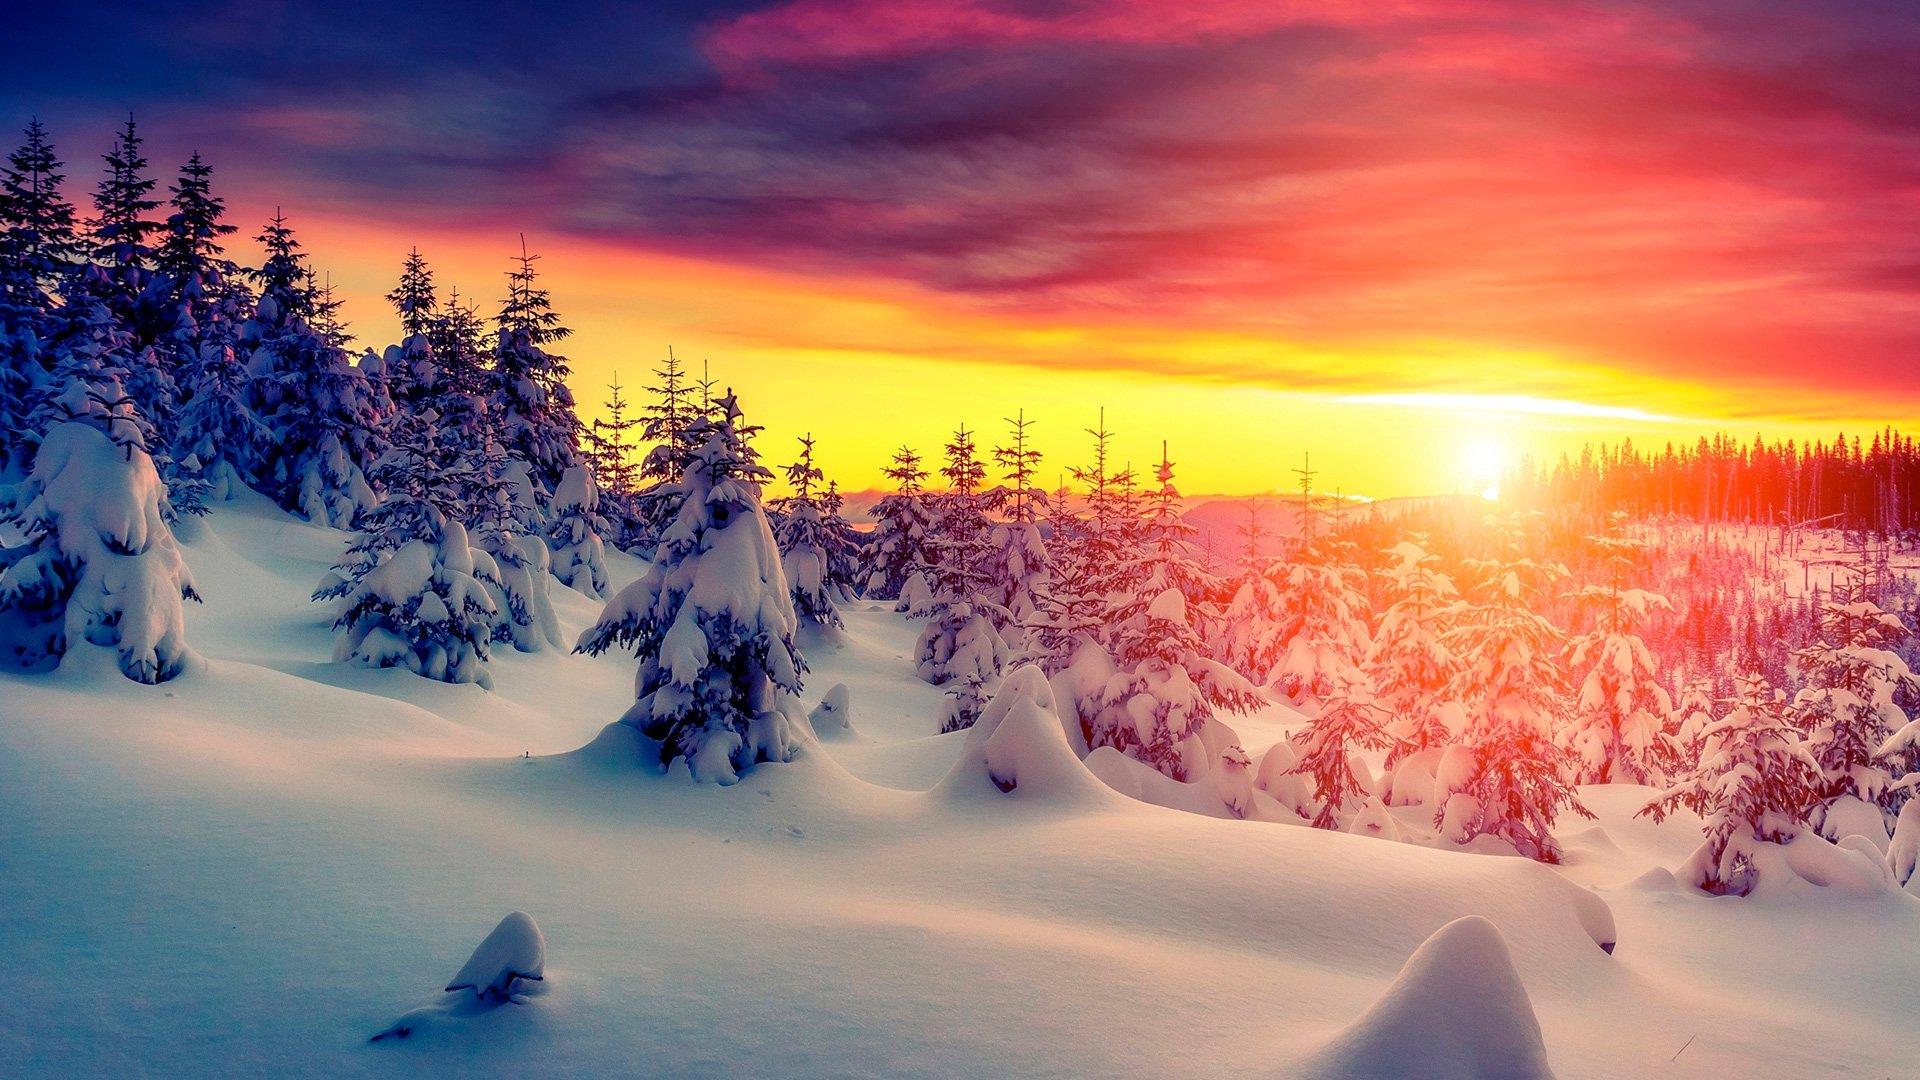 Winter Aesthetic Wallpaper Pic